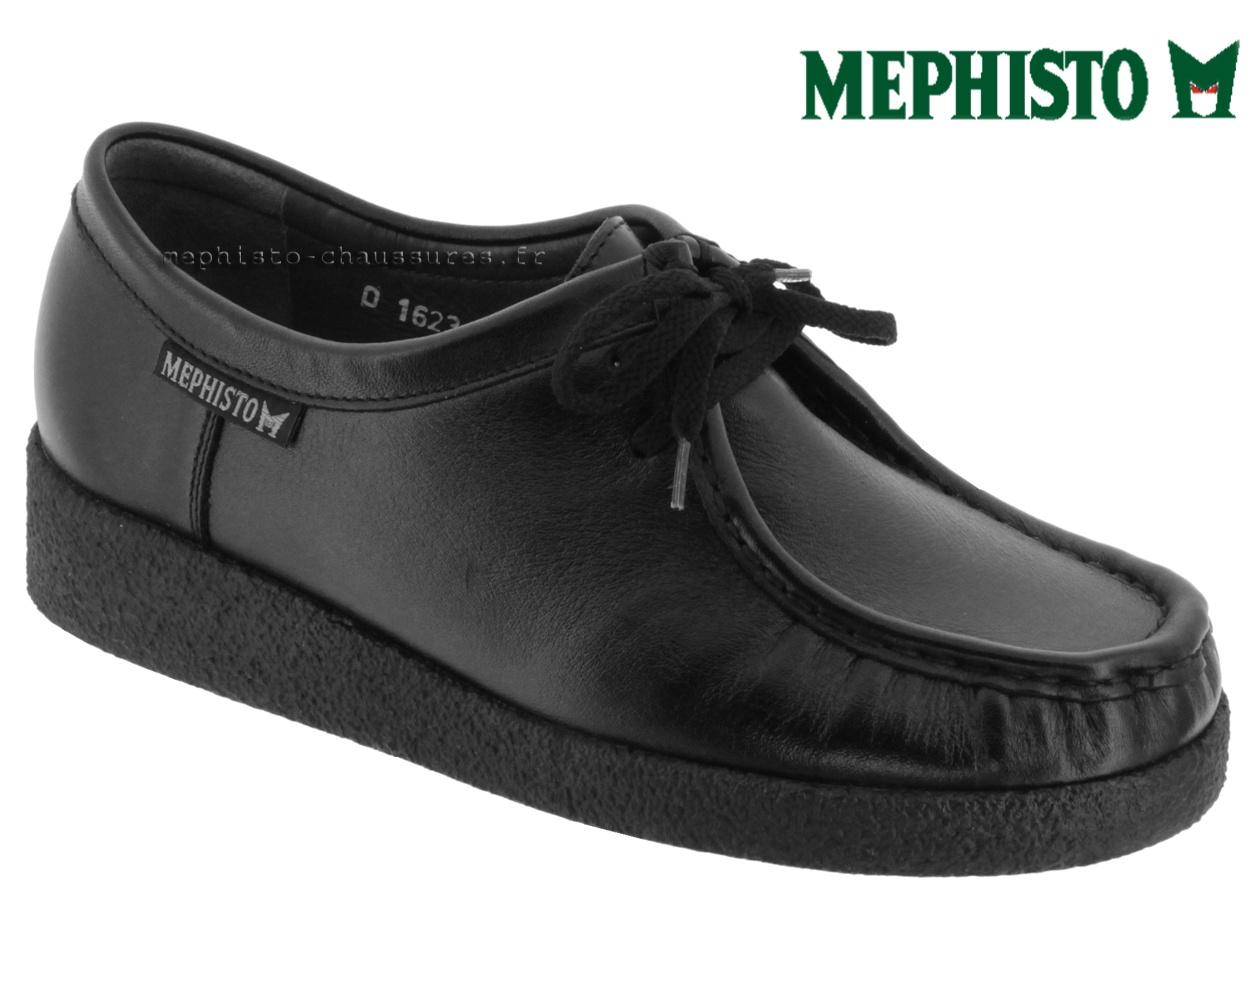 1a1313af6bf ✓ Chaussures   Pointure 36FR   EUR3.5   Pour Femme   Categorie ...